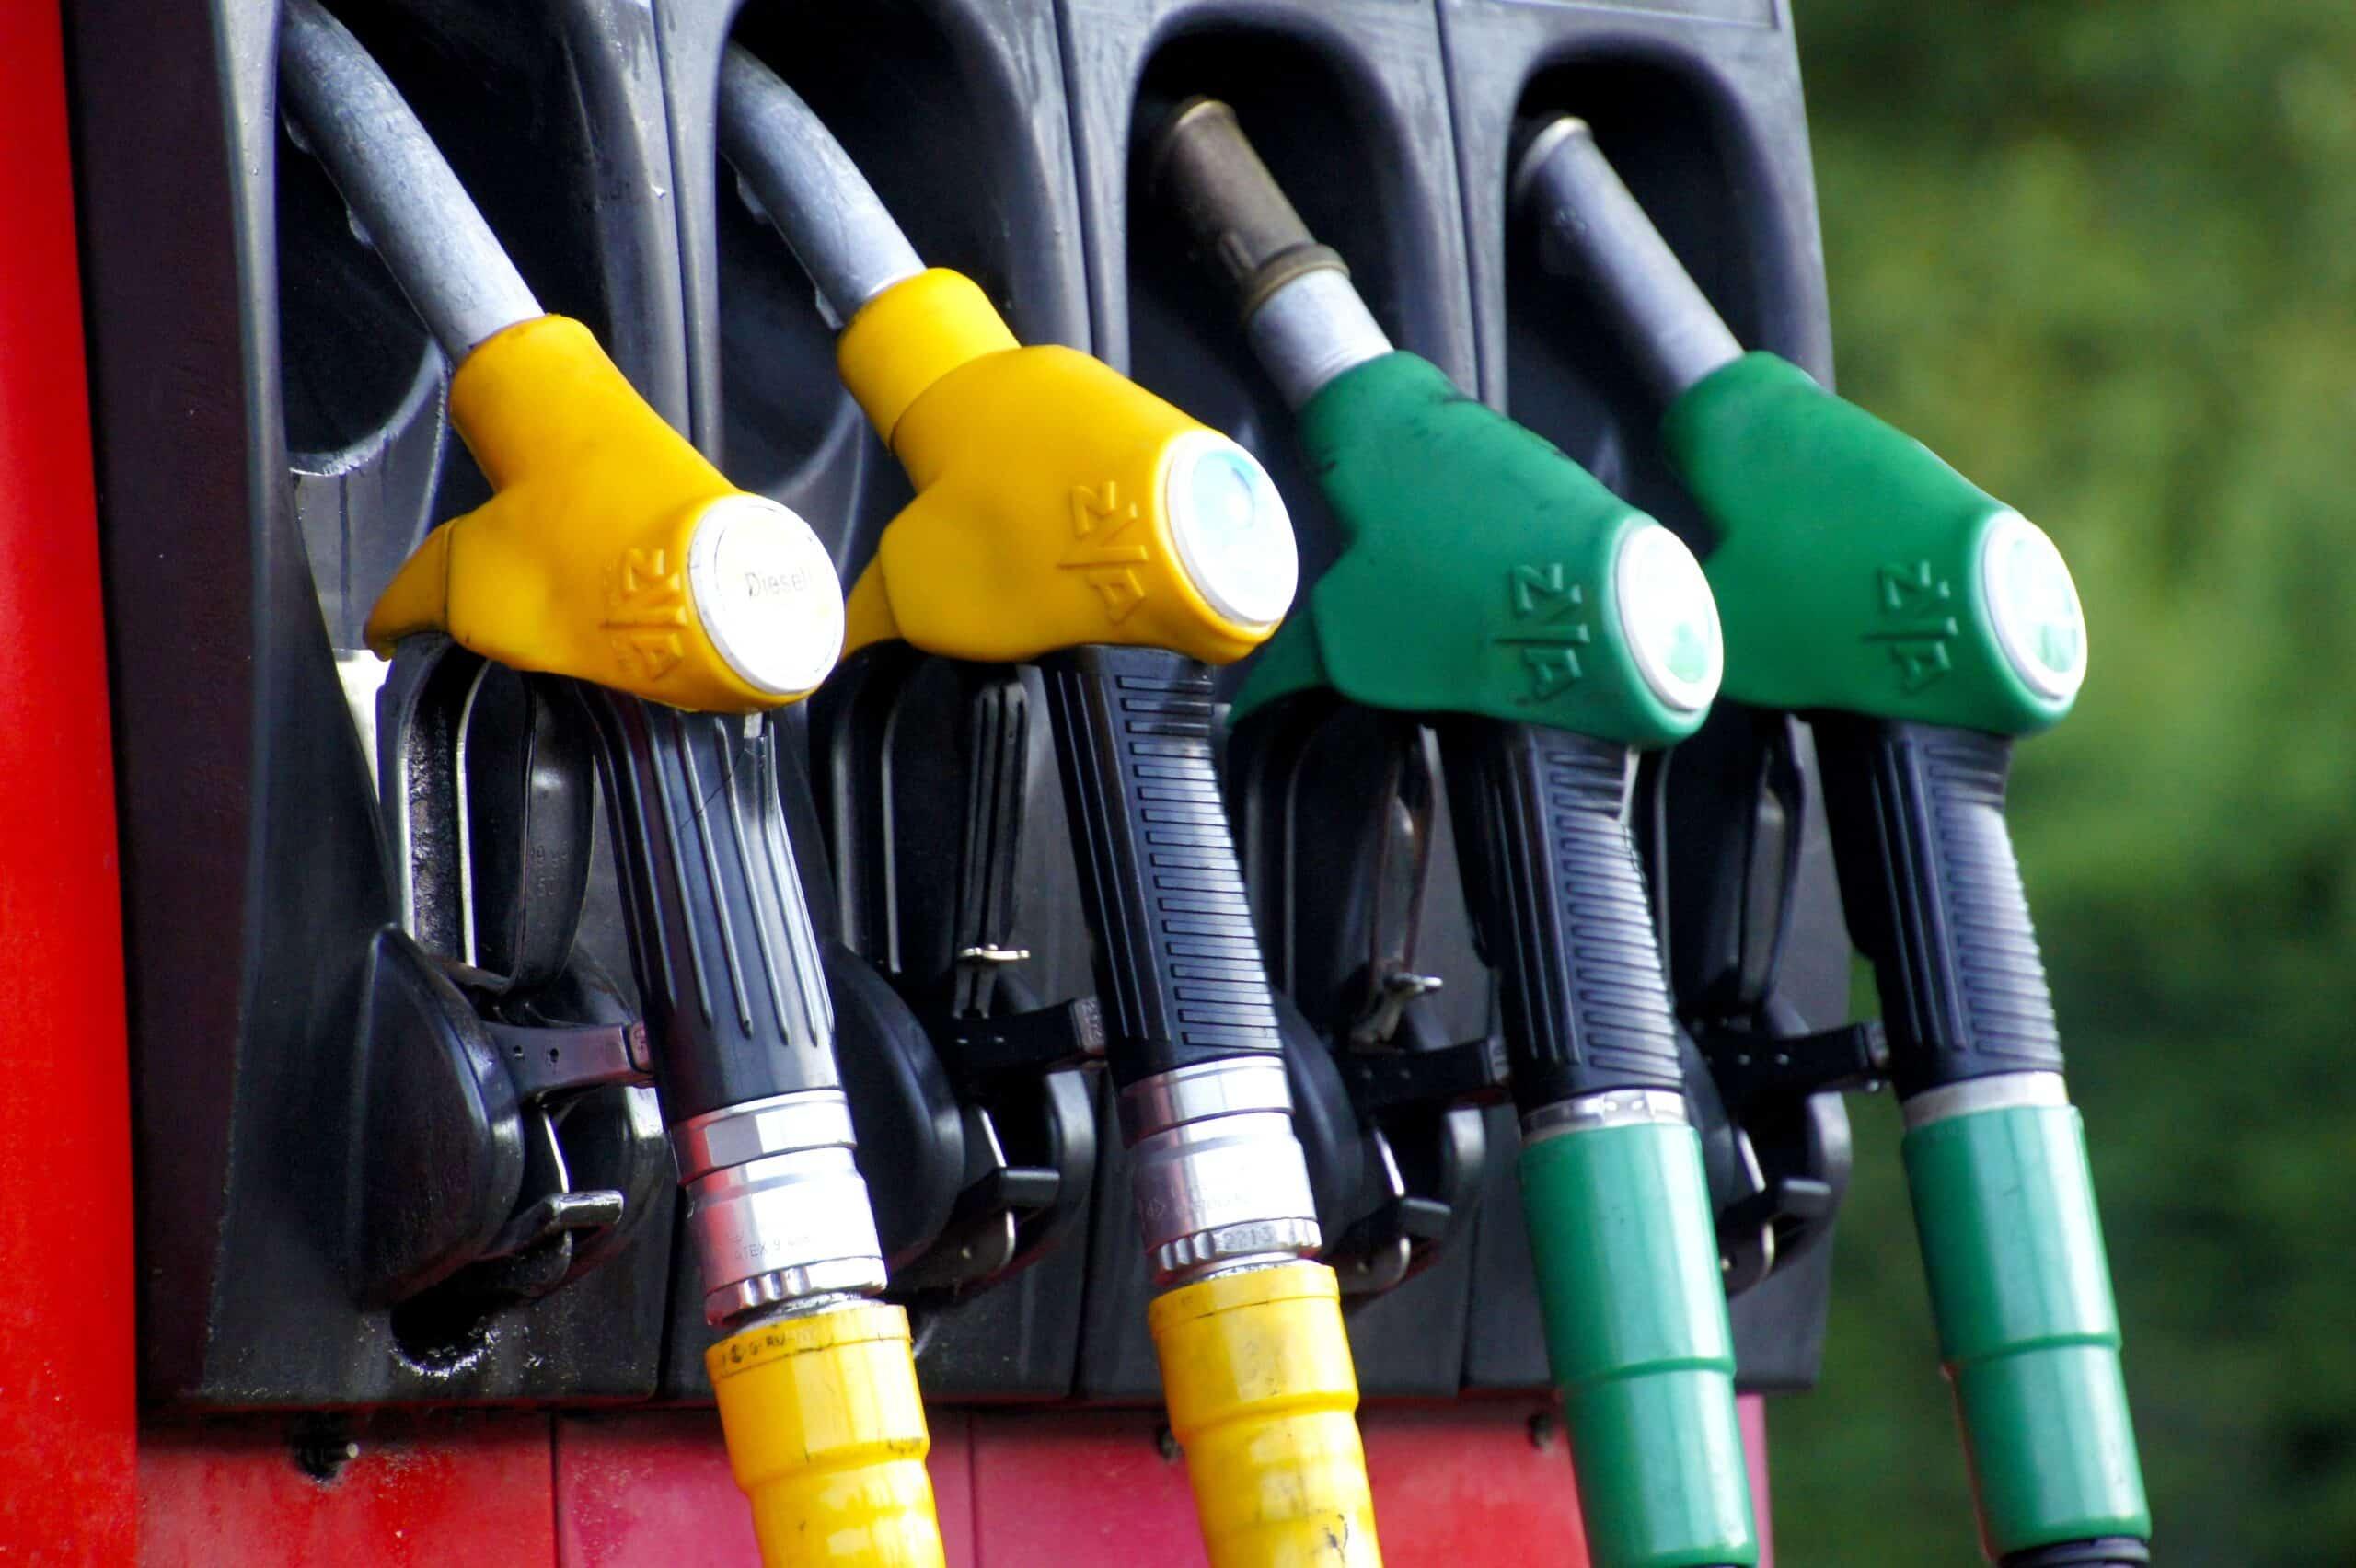 gasolina - diesel - etanol - combustível - preço - borracha - pneu - Continental - Pirelli - Michellin